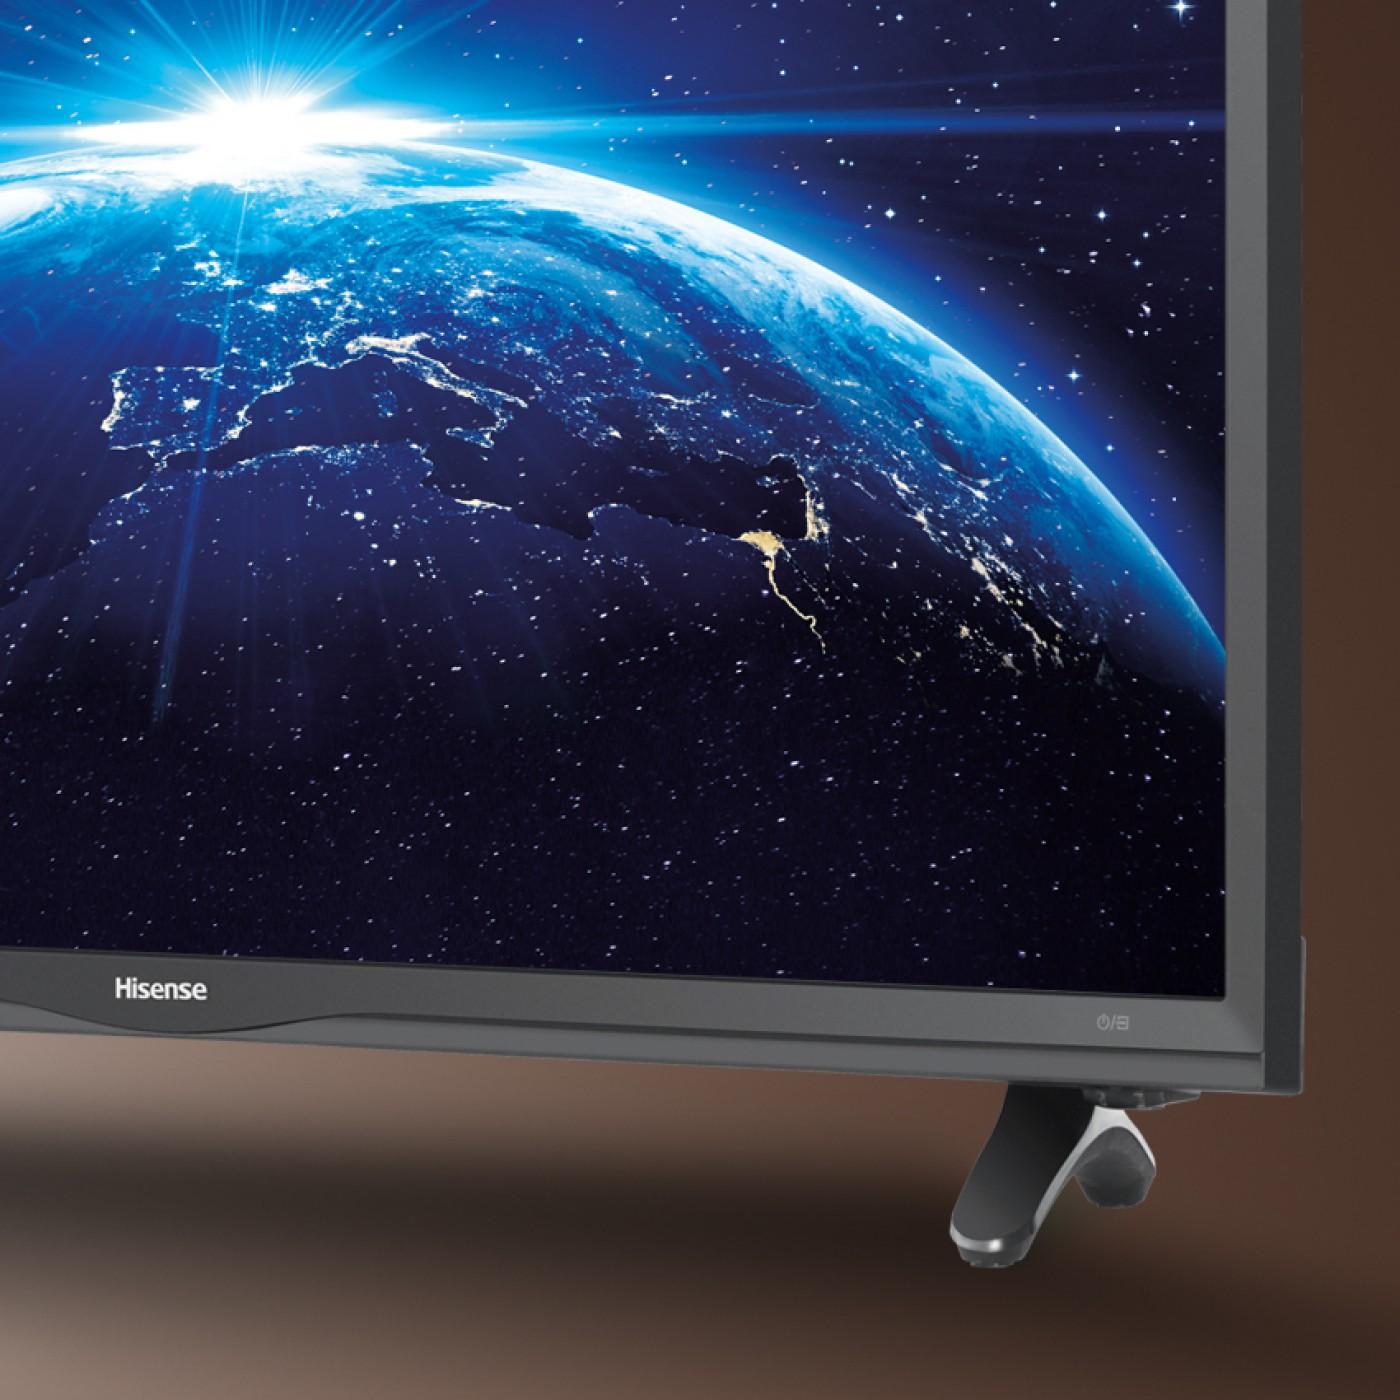 تلویزیون ال ای دی هایسنس مدل 40N2176P سایز ۴۰ اینچ